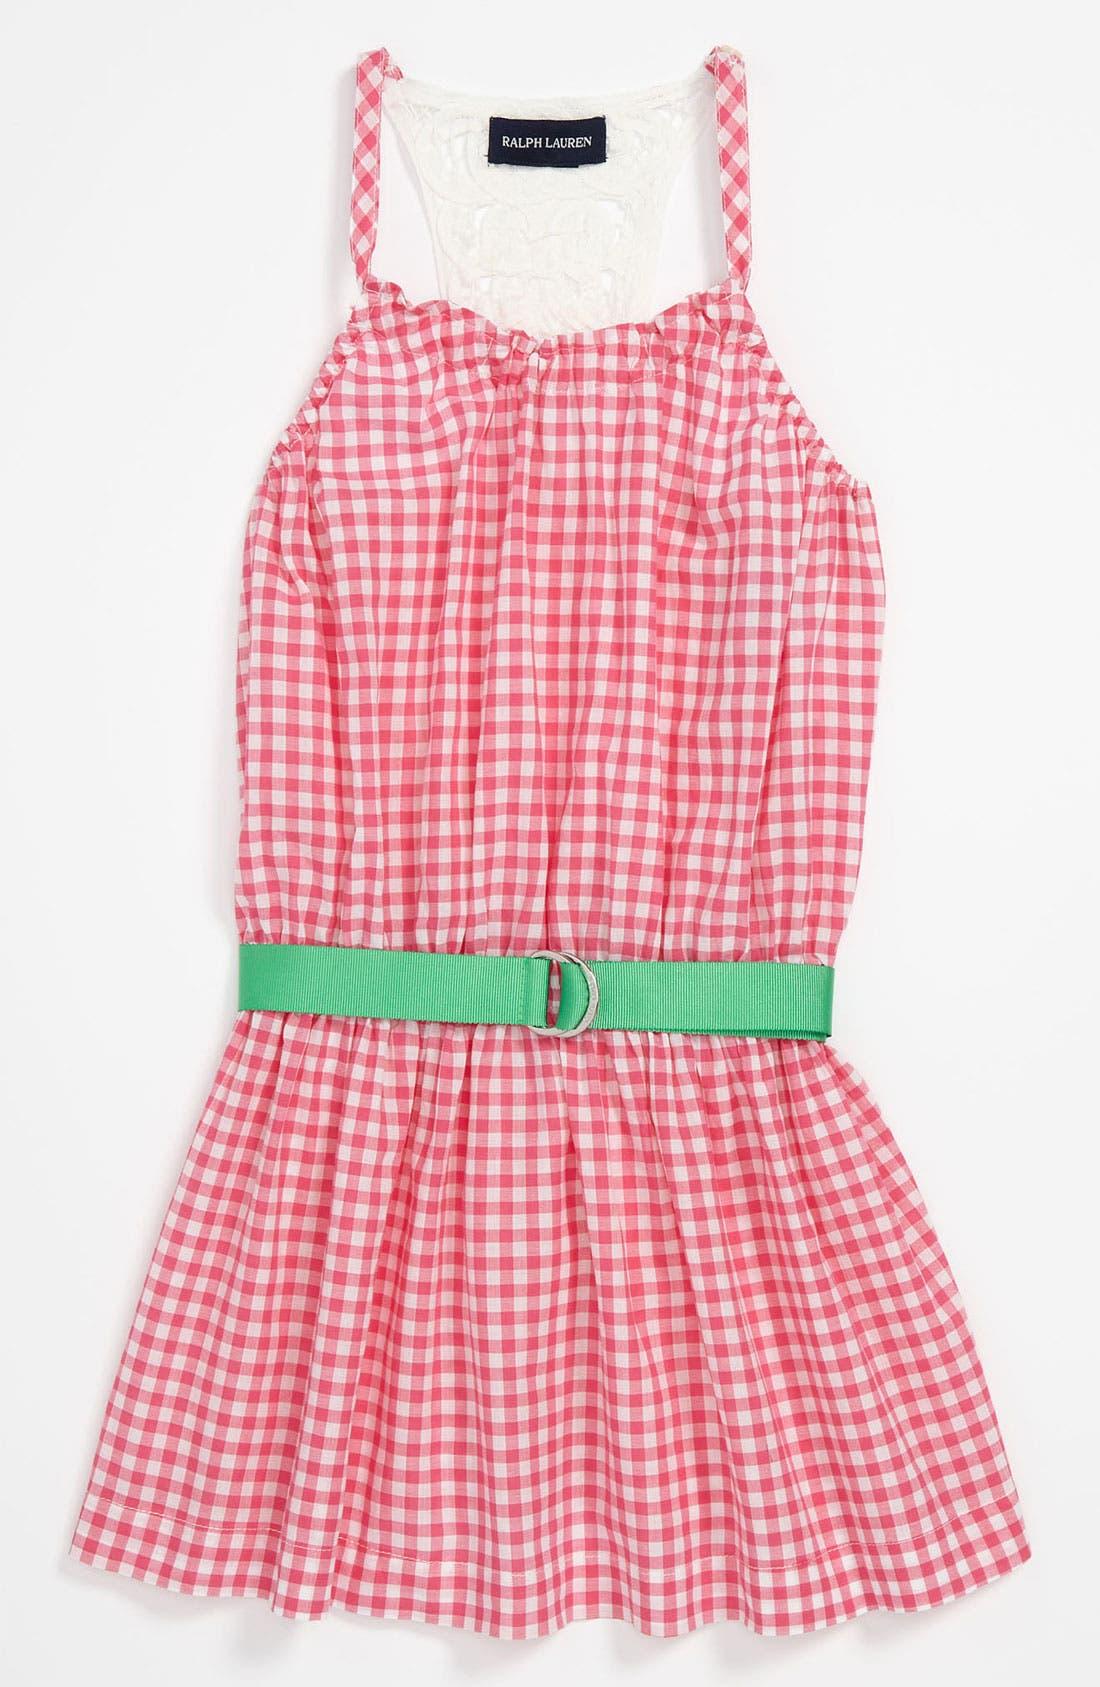 Alternate Image 1 Selected - Ralph Lauren Gingham Dress (Toddler)